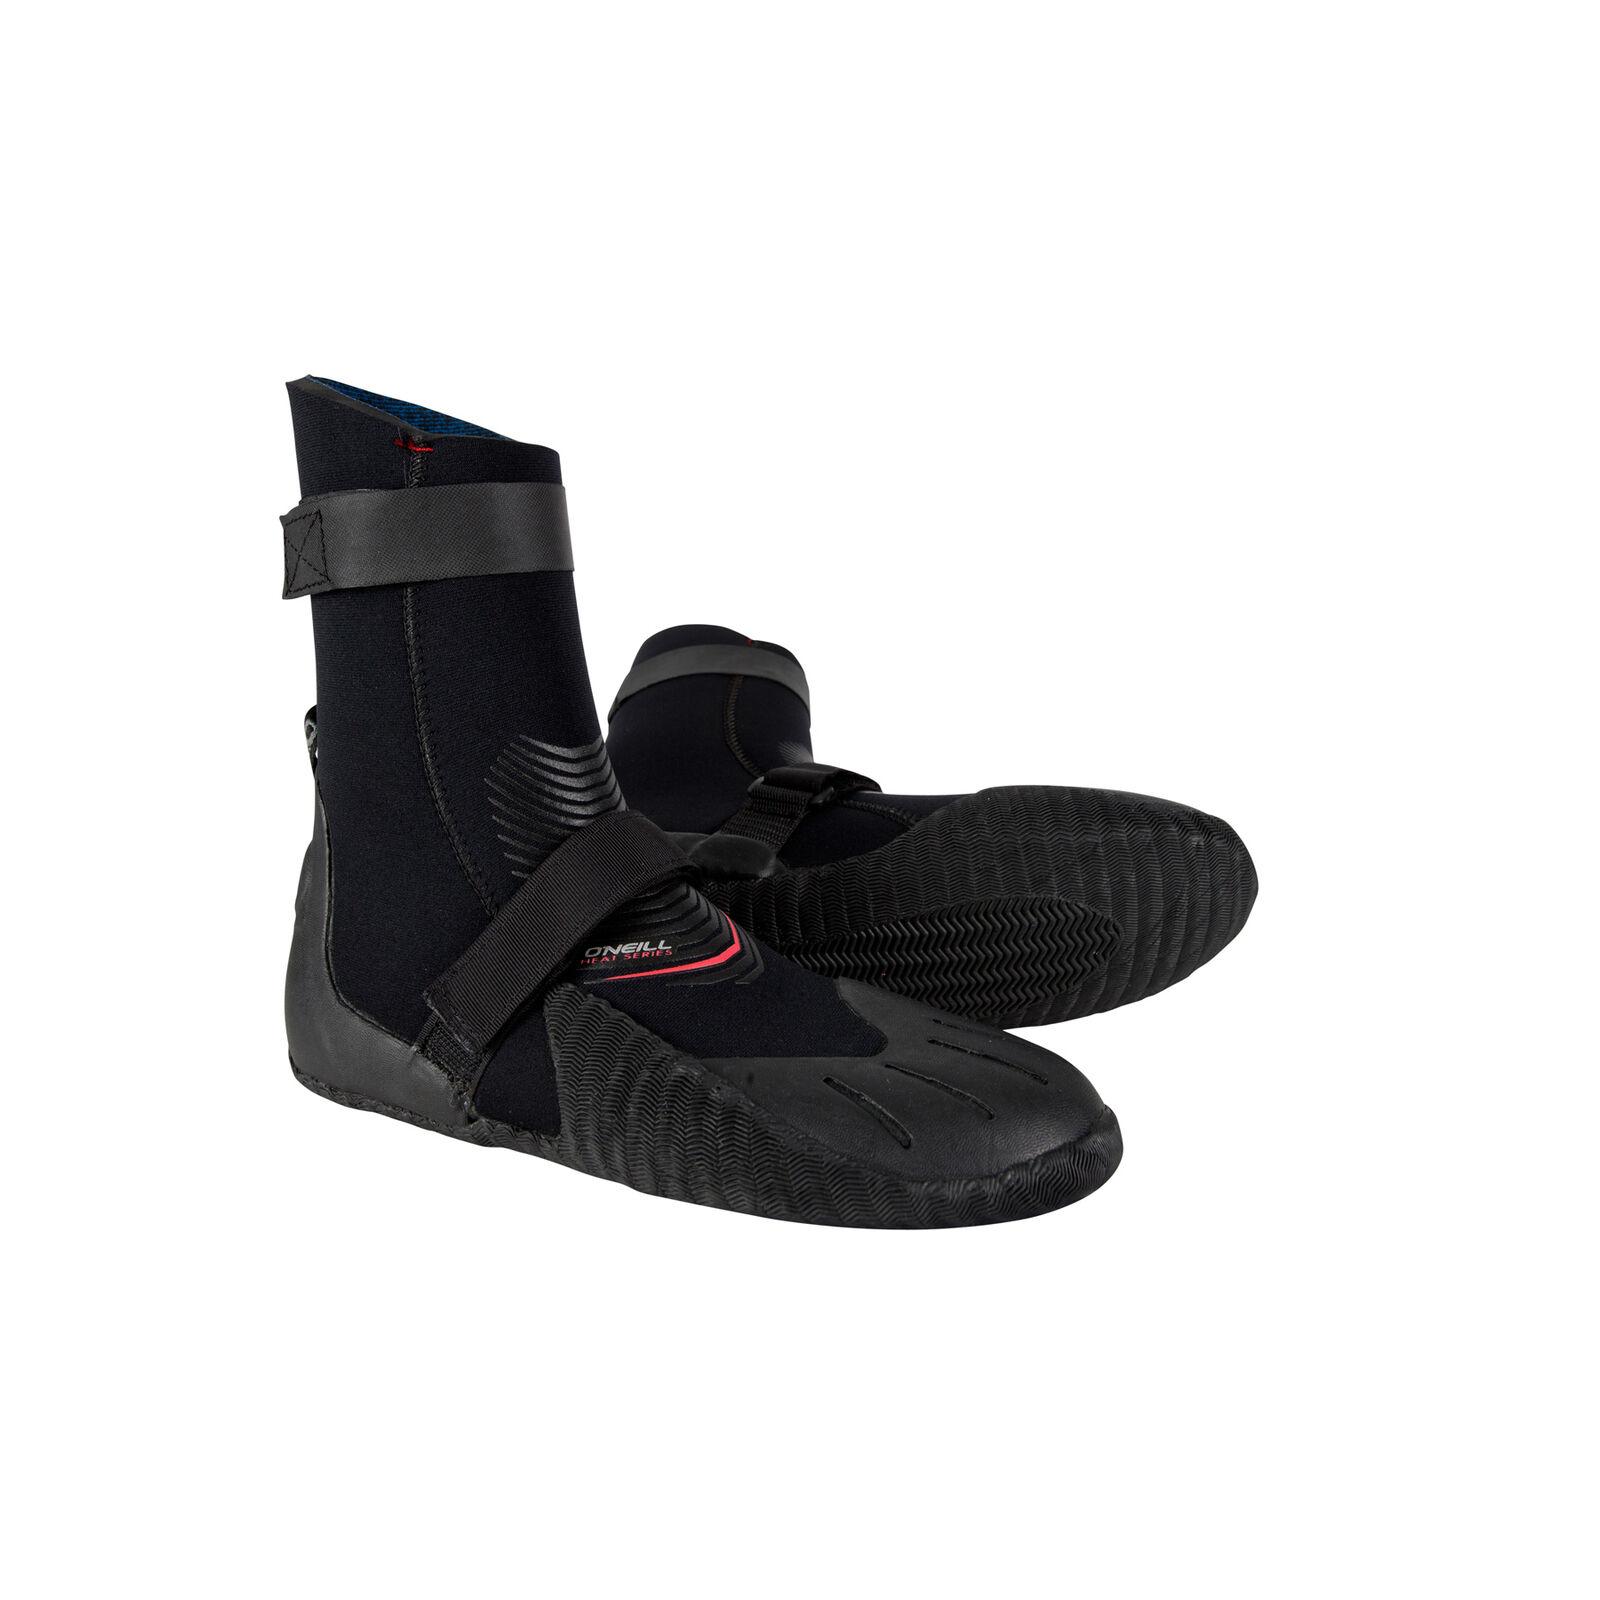 O'Neill Heat 7mm Round Toe Boots